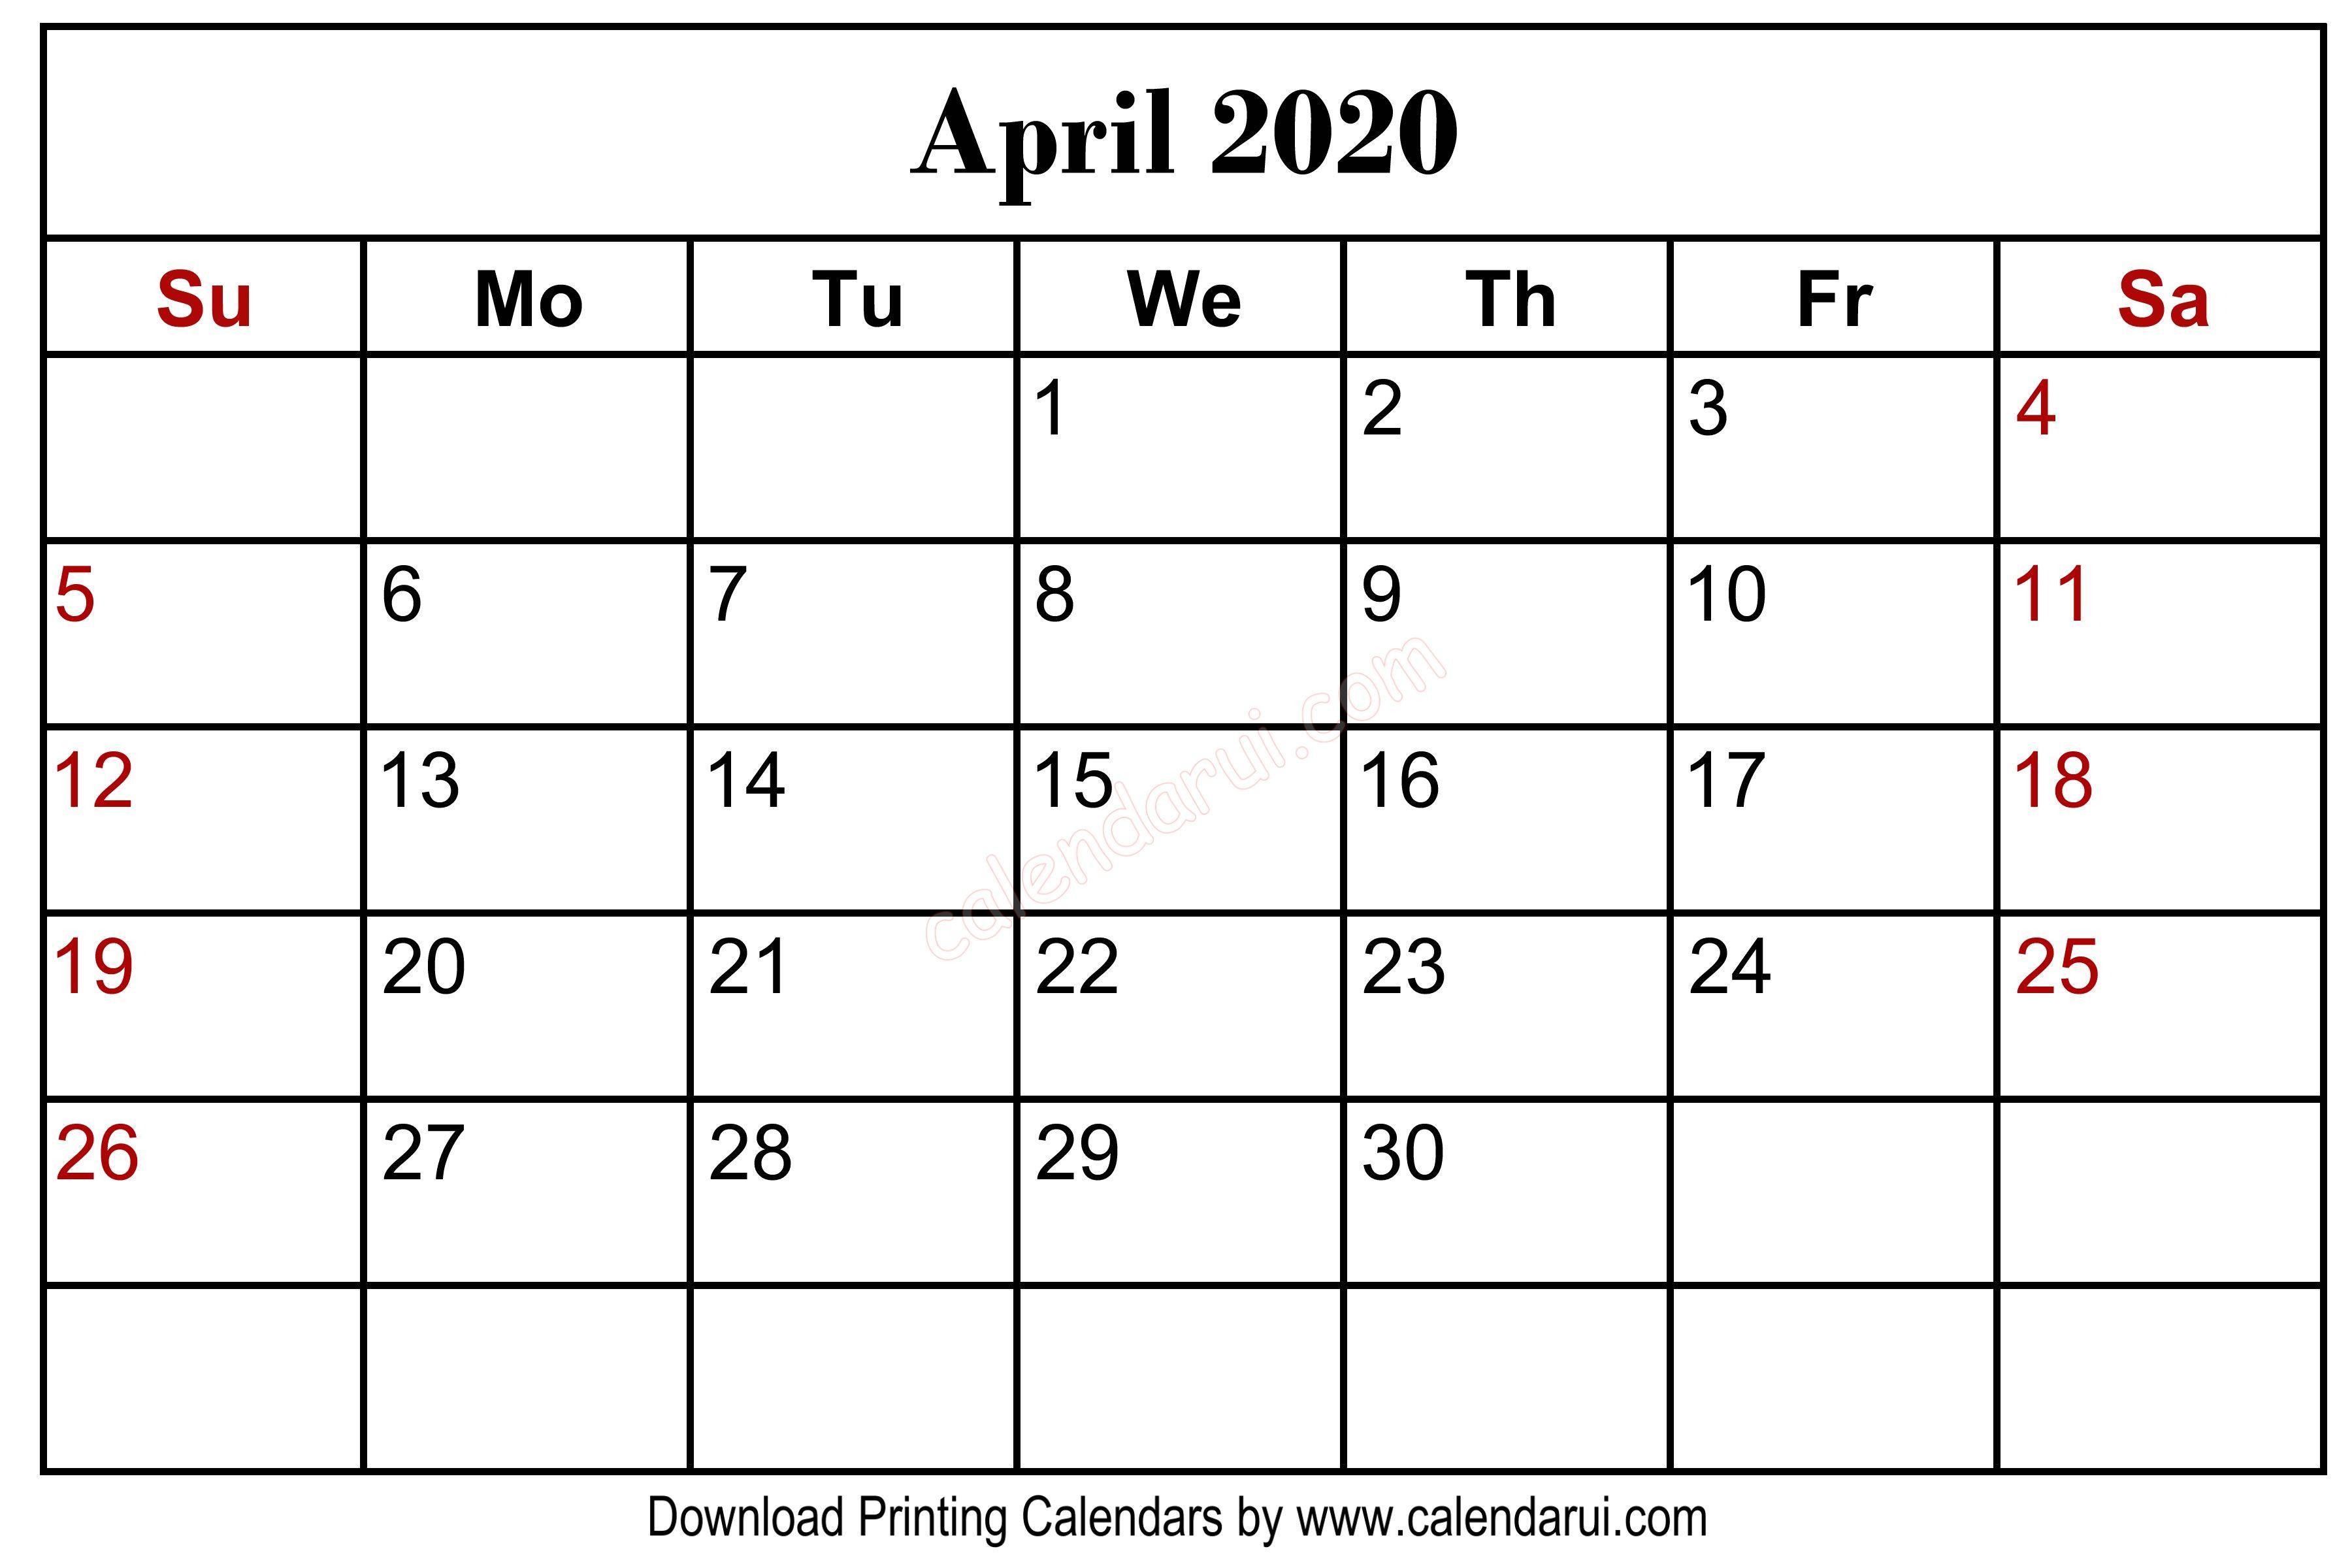 April 2020 Blank Calendar Printable Centre Header | Monthly Calendar with 11 X 8.5 Calendar Pages 2020 Free